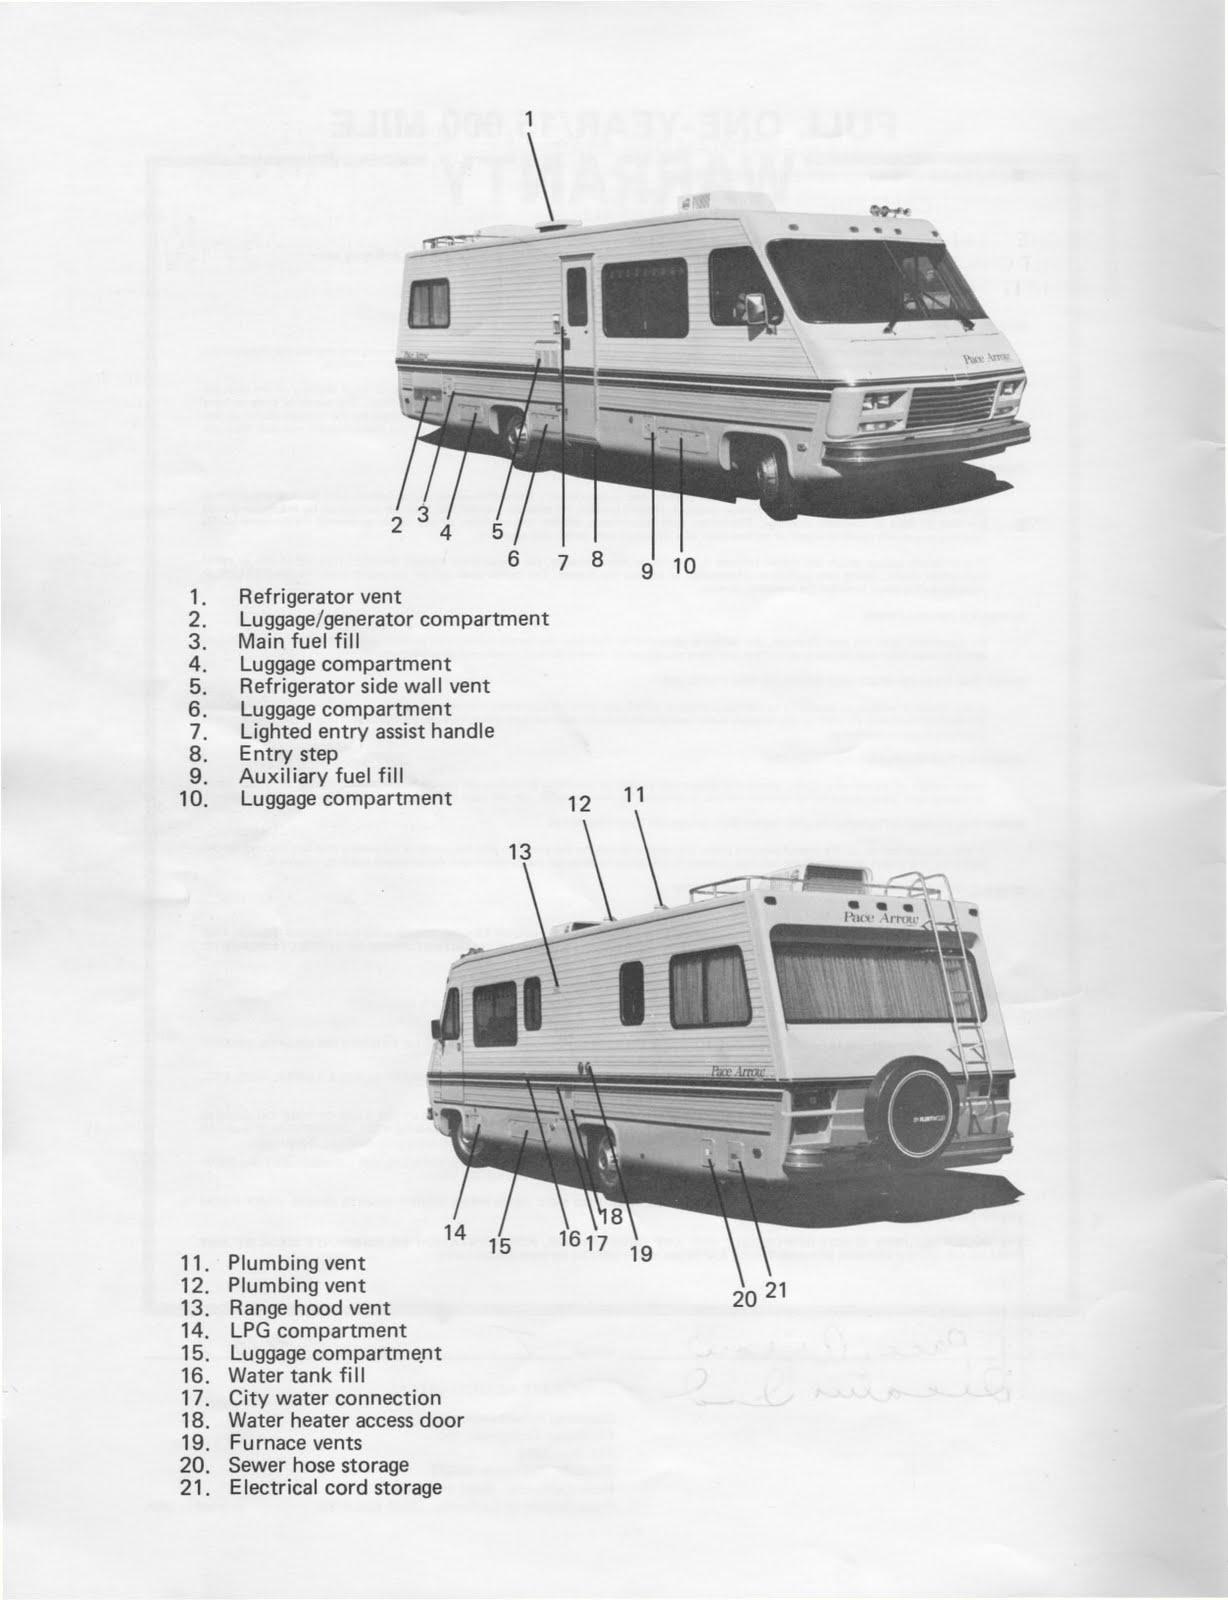 1988 Pace Arrow Motorhome Wiring Wire Center Fleetwood Rv Battery Diagram 1983 Owners Manuals Rh 1983fleetwoodpacearrowownersmanuals Blogspot Com